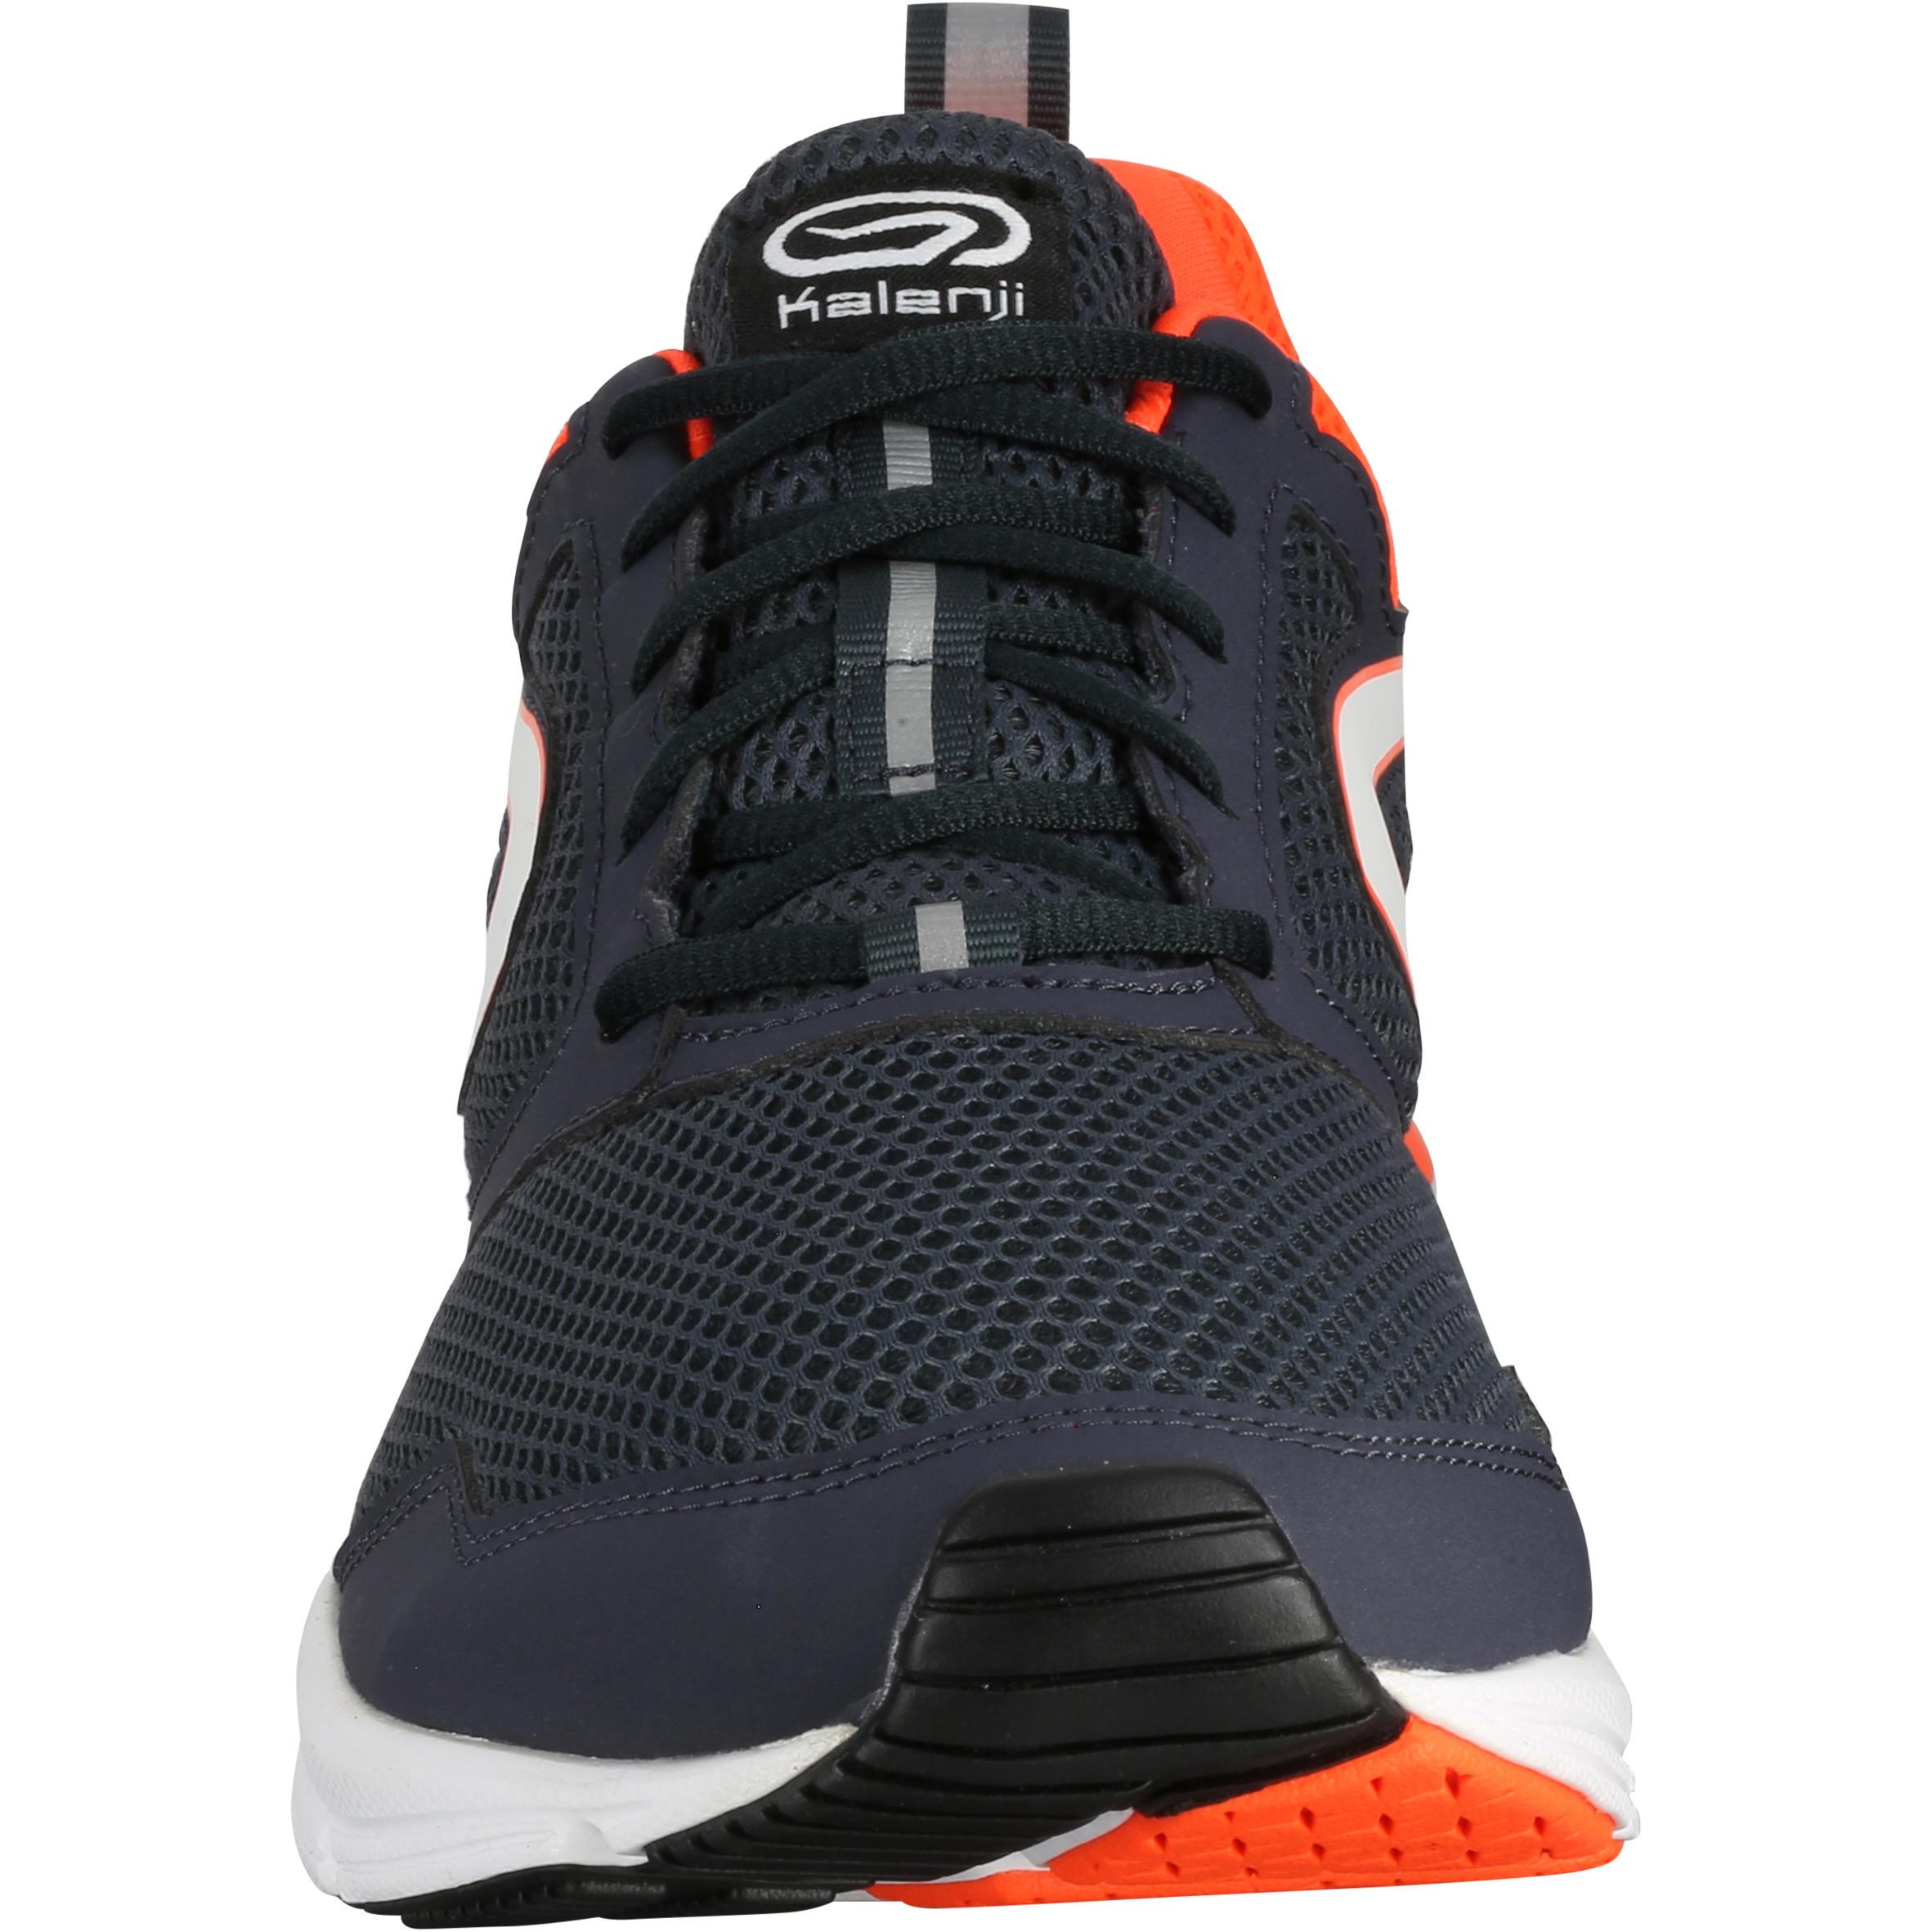 RUN ACTIVE MEN'S RUNNING SHOES - BLACK